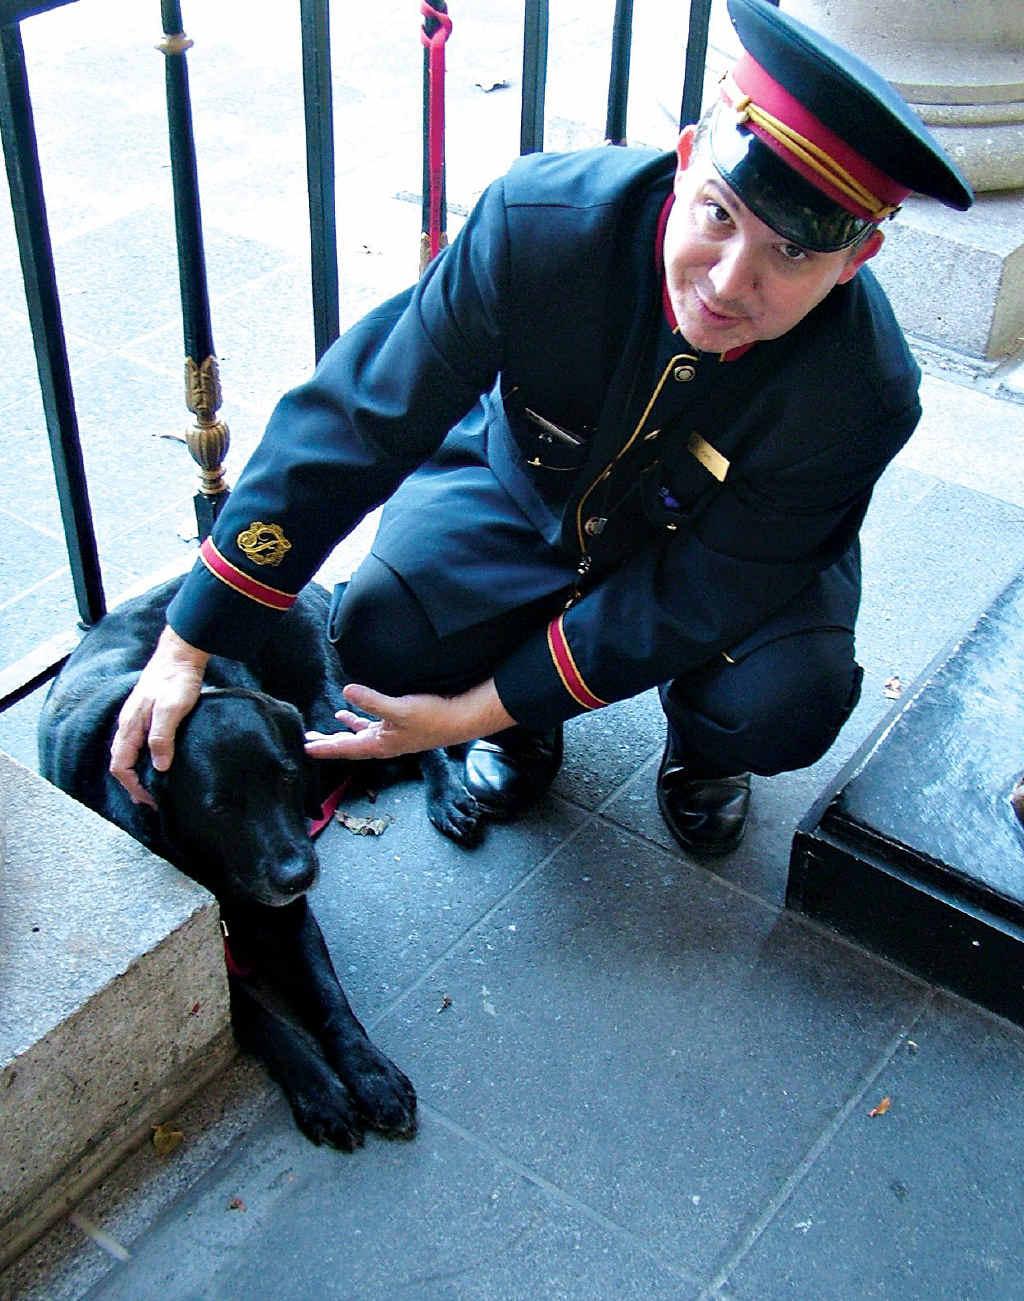 Catie, this Boston hotel's canine concierge.